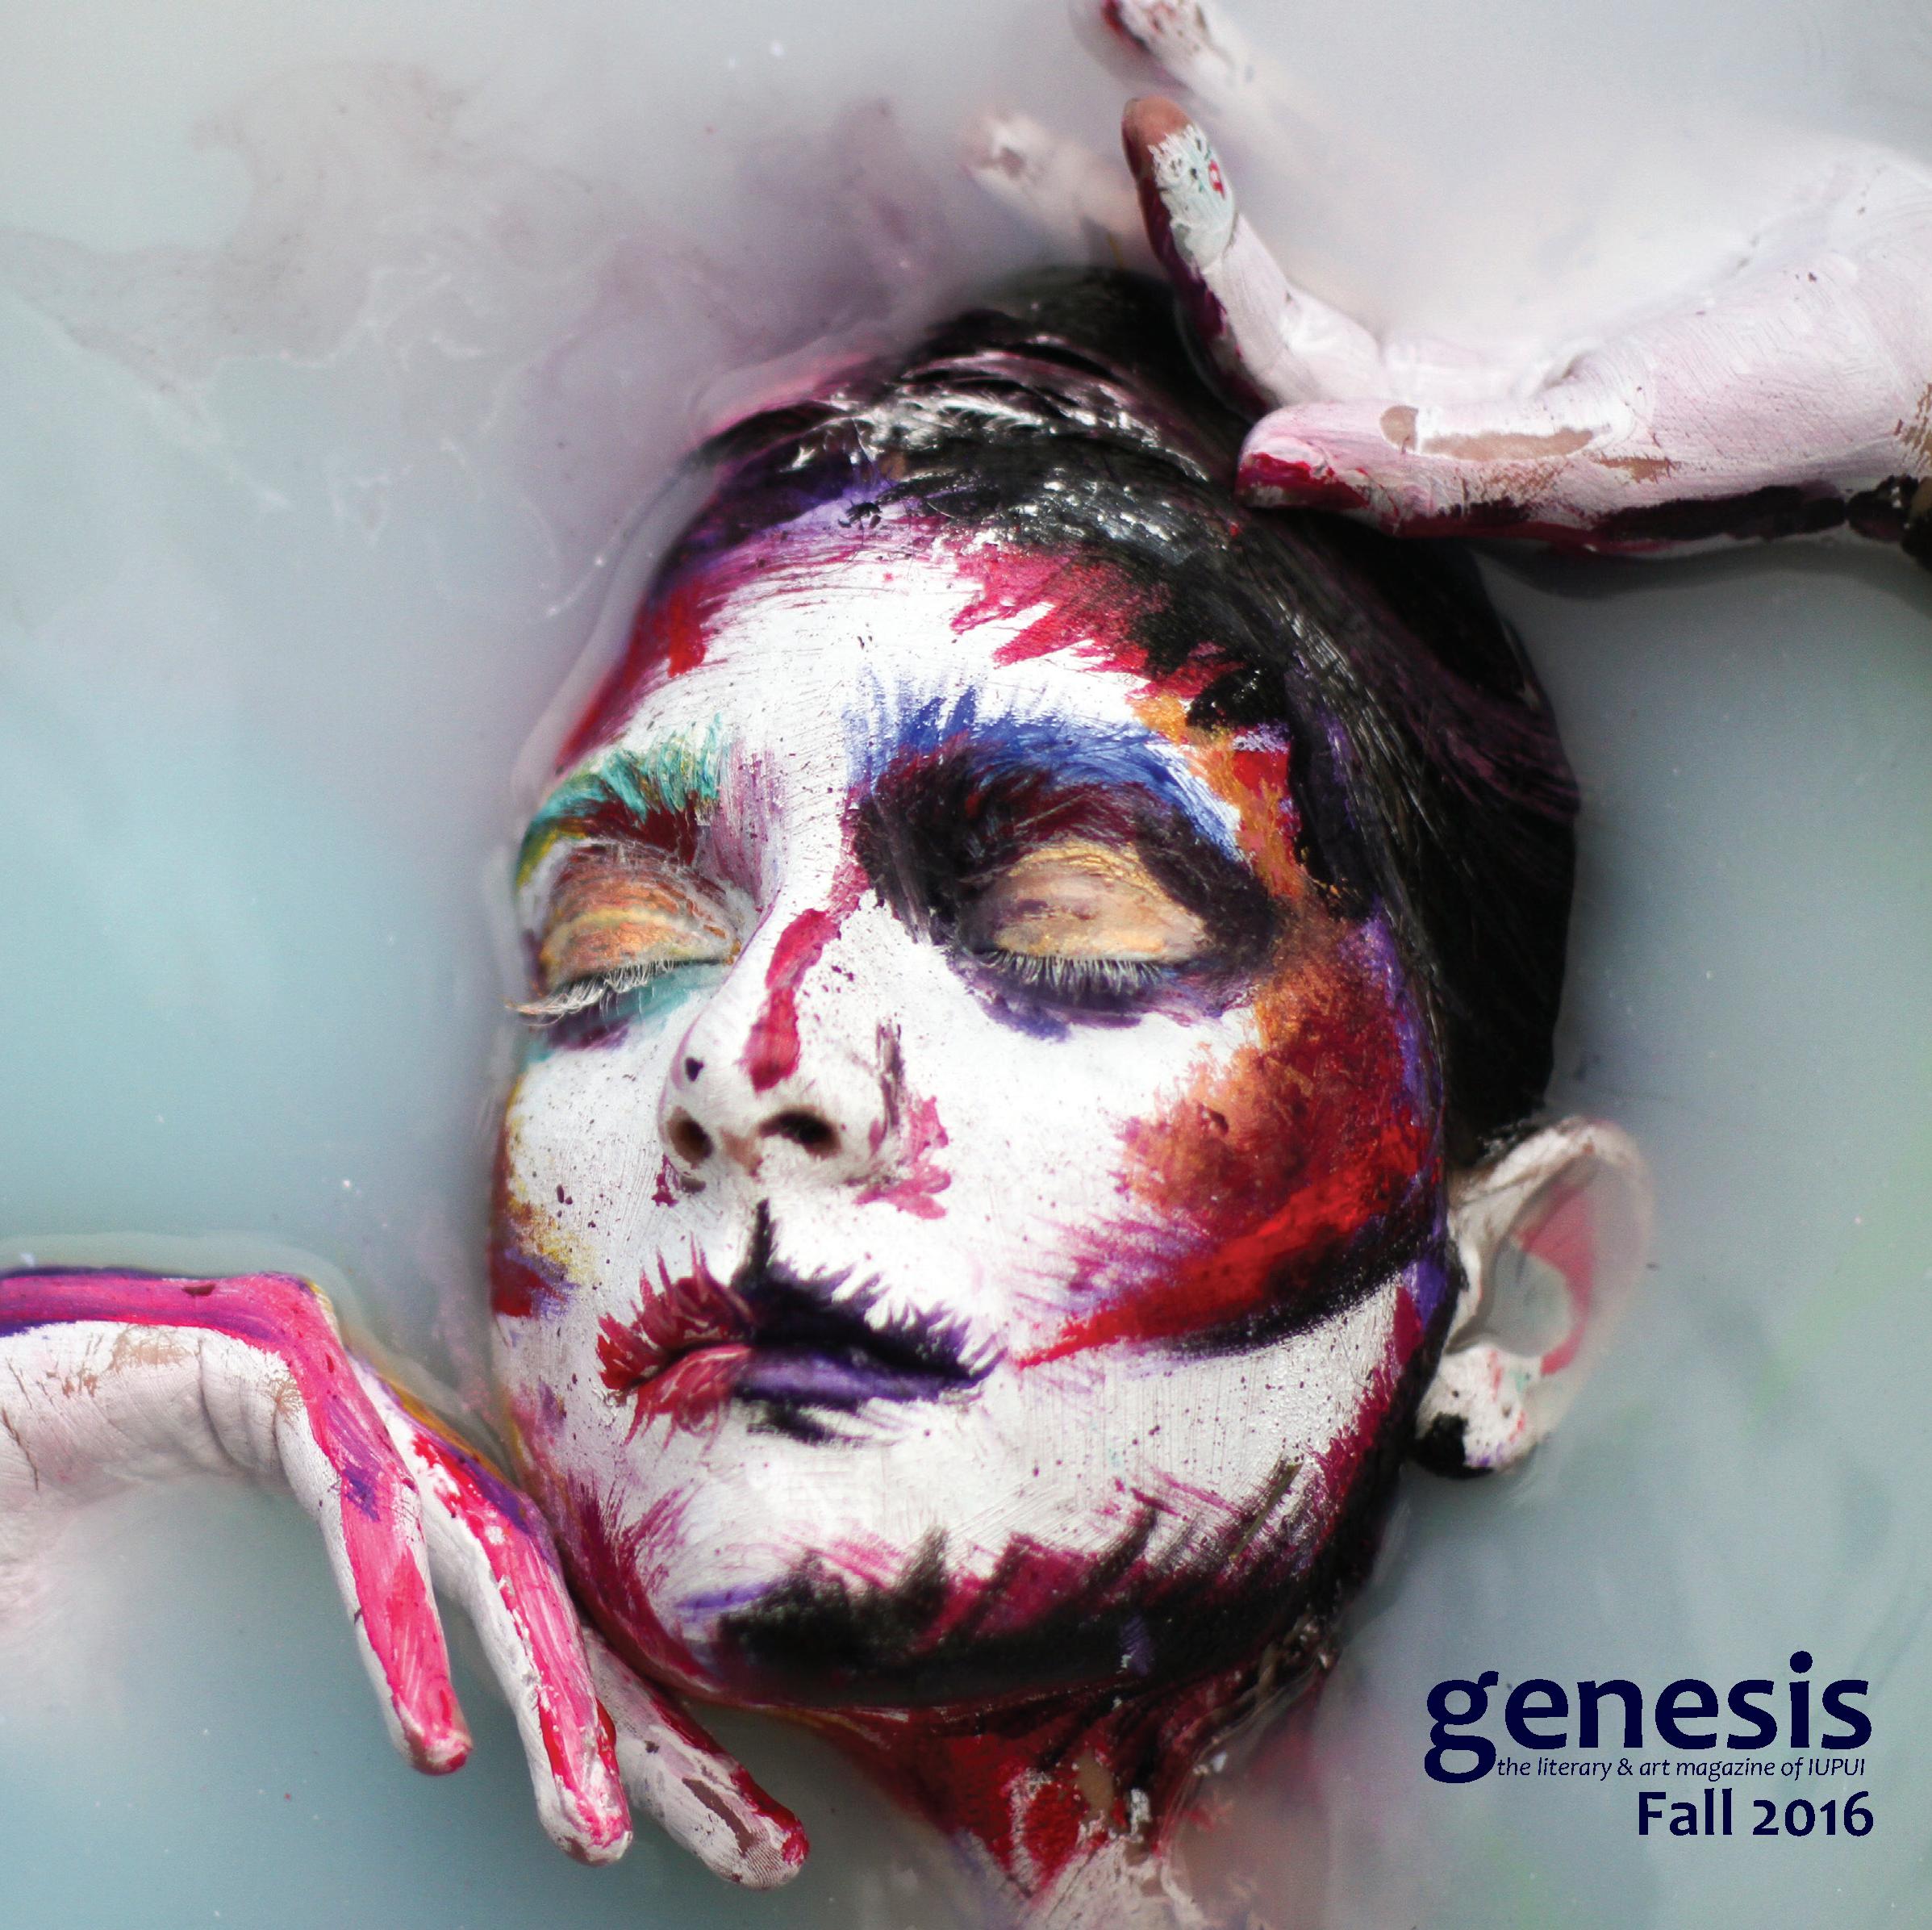 genesis fall 2016 cover